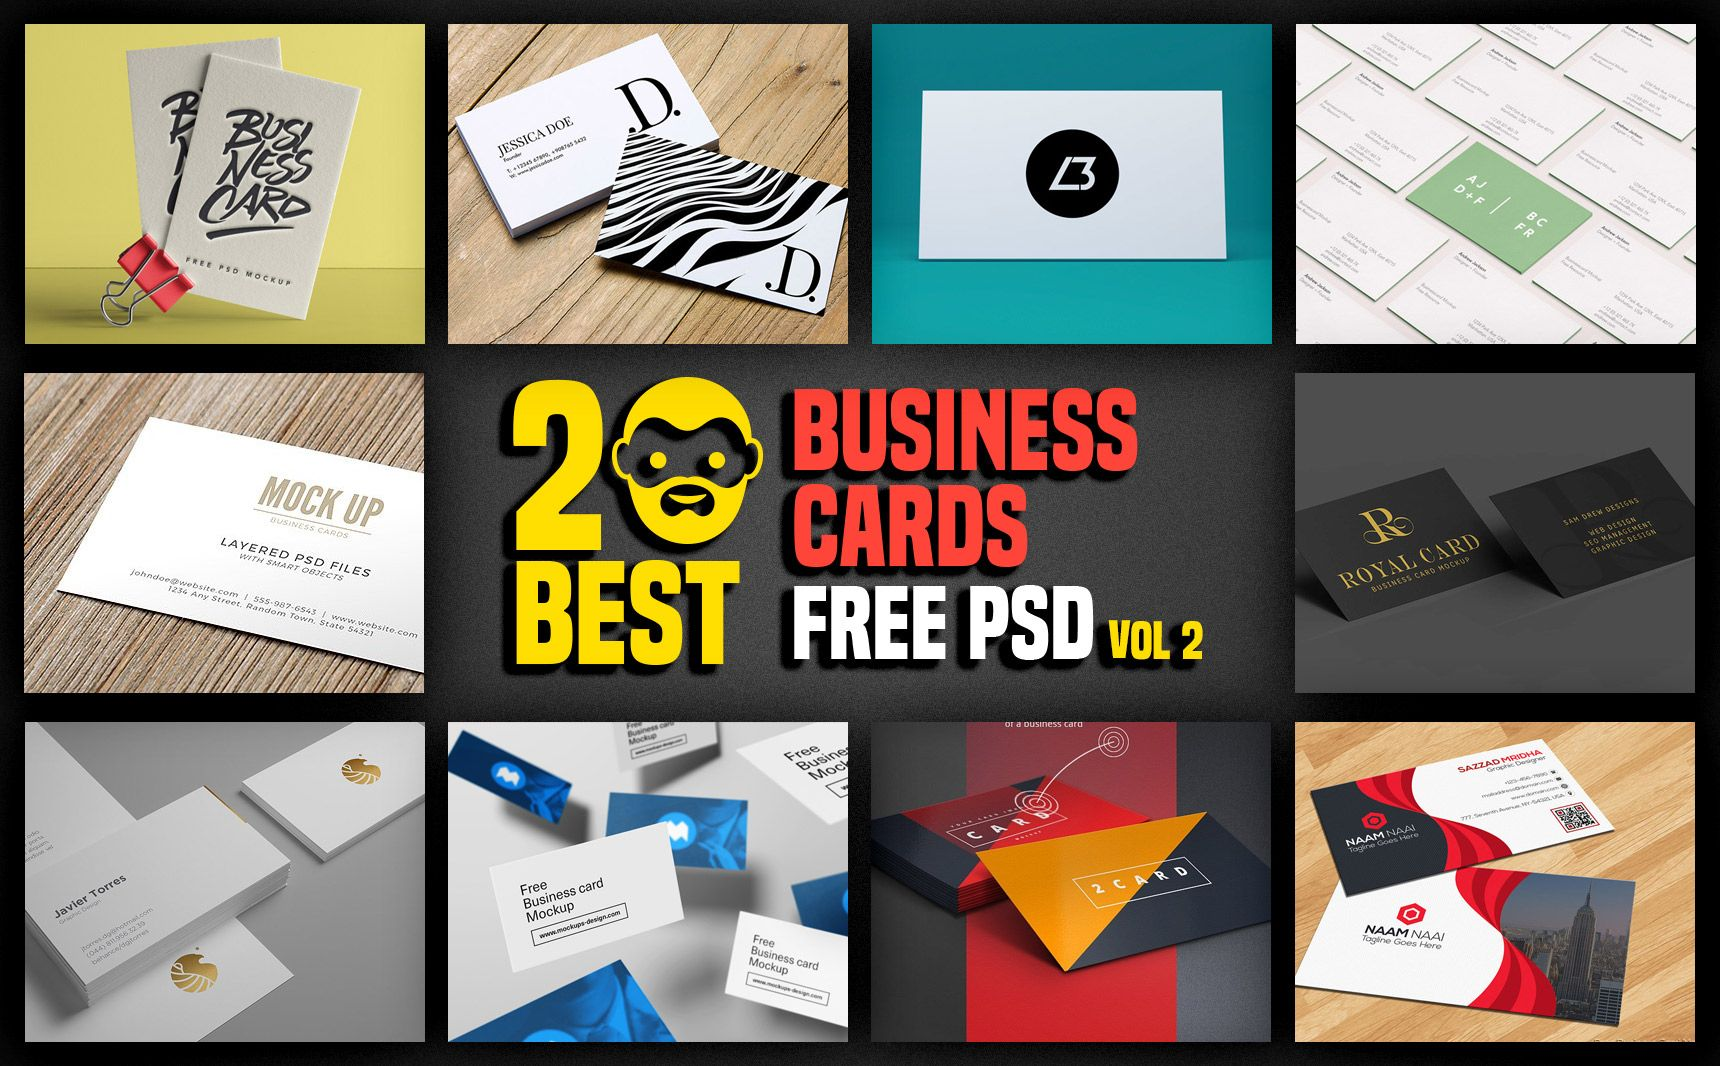 20 Best Business Cards Free Psd Vol 2 Psddaddy Throughout Business Card Maker Template S Free Business Card Maker Business Card Maker Business Card Creator